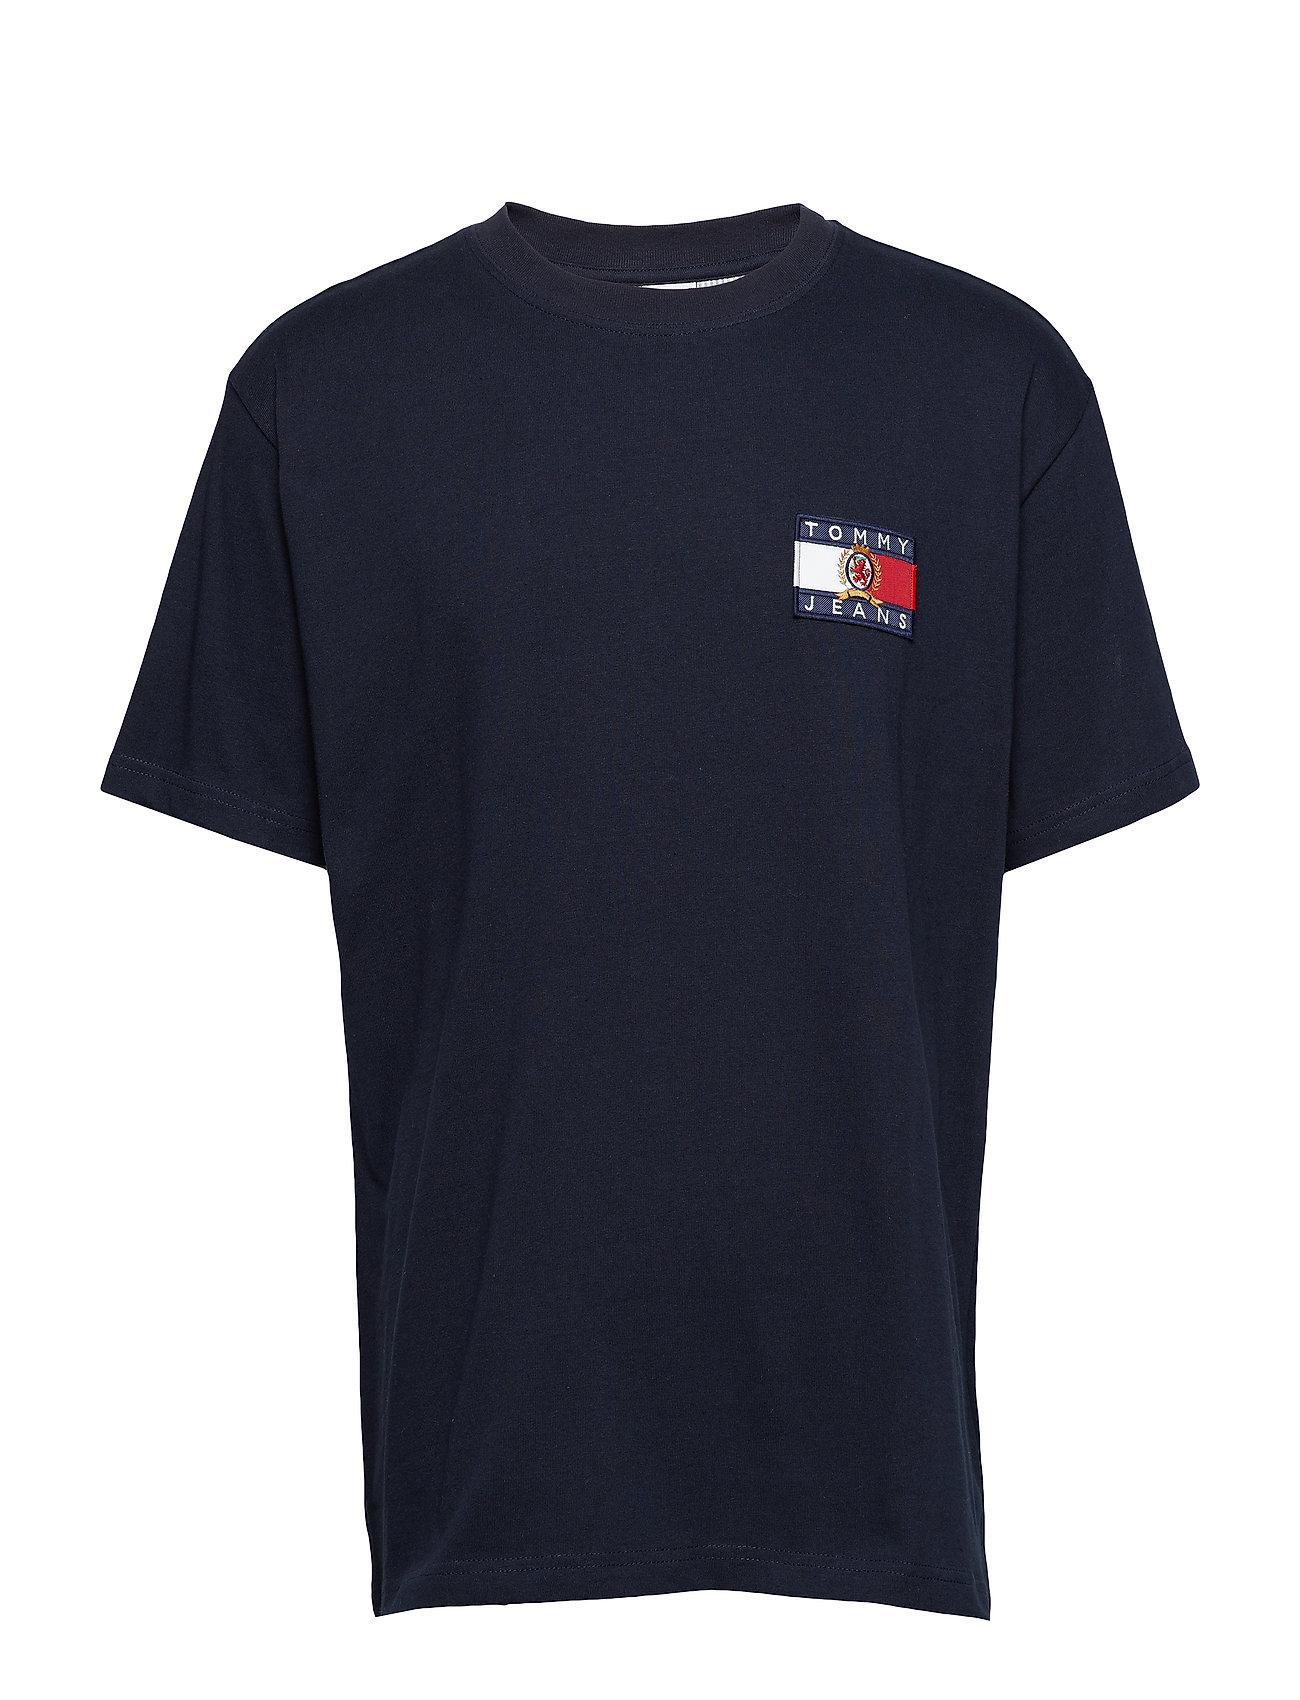 Tee Tjm Jeans SapphireTommy Crest Flag Mdark qSVzMUpG